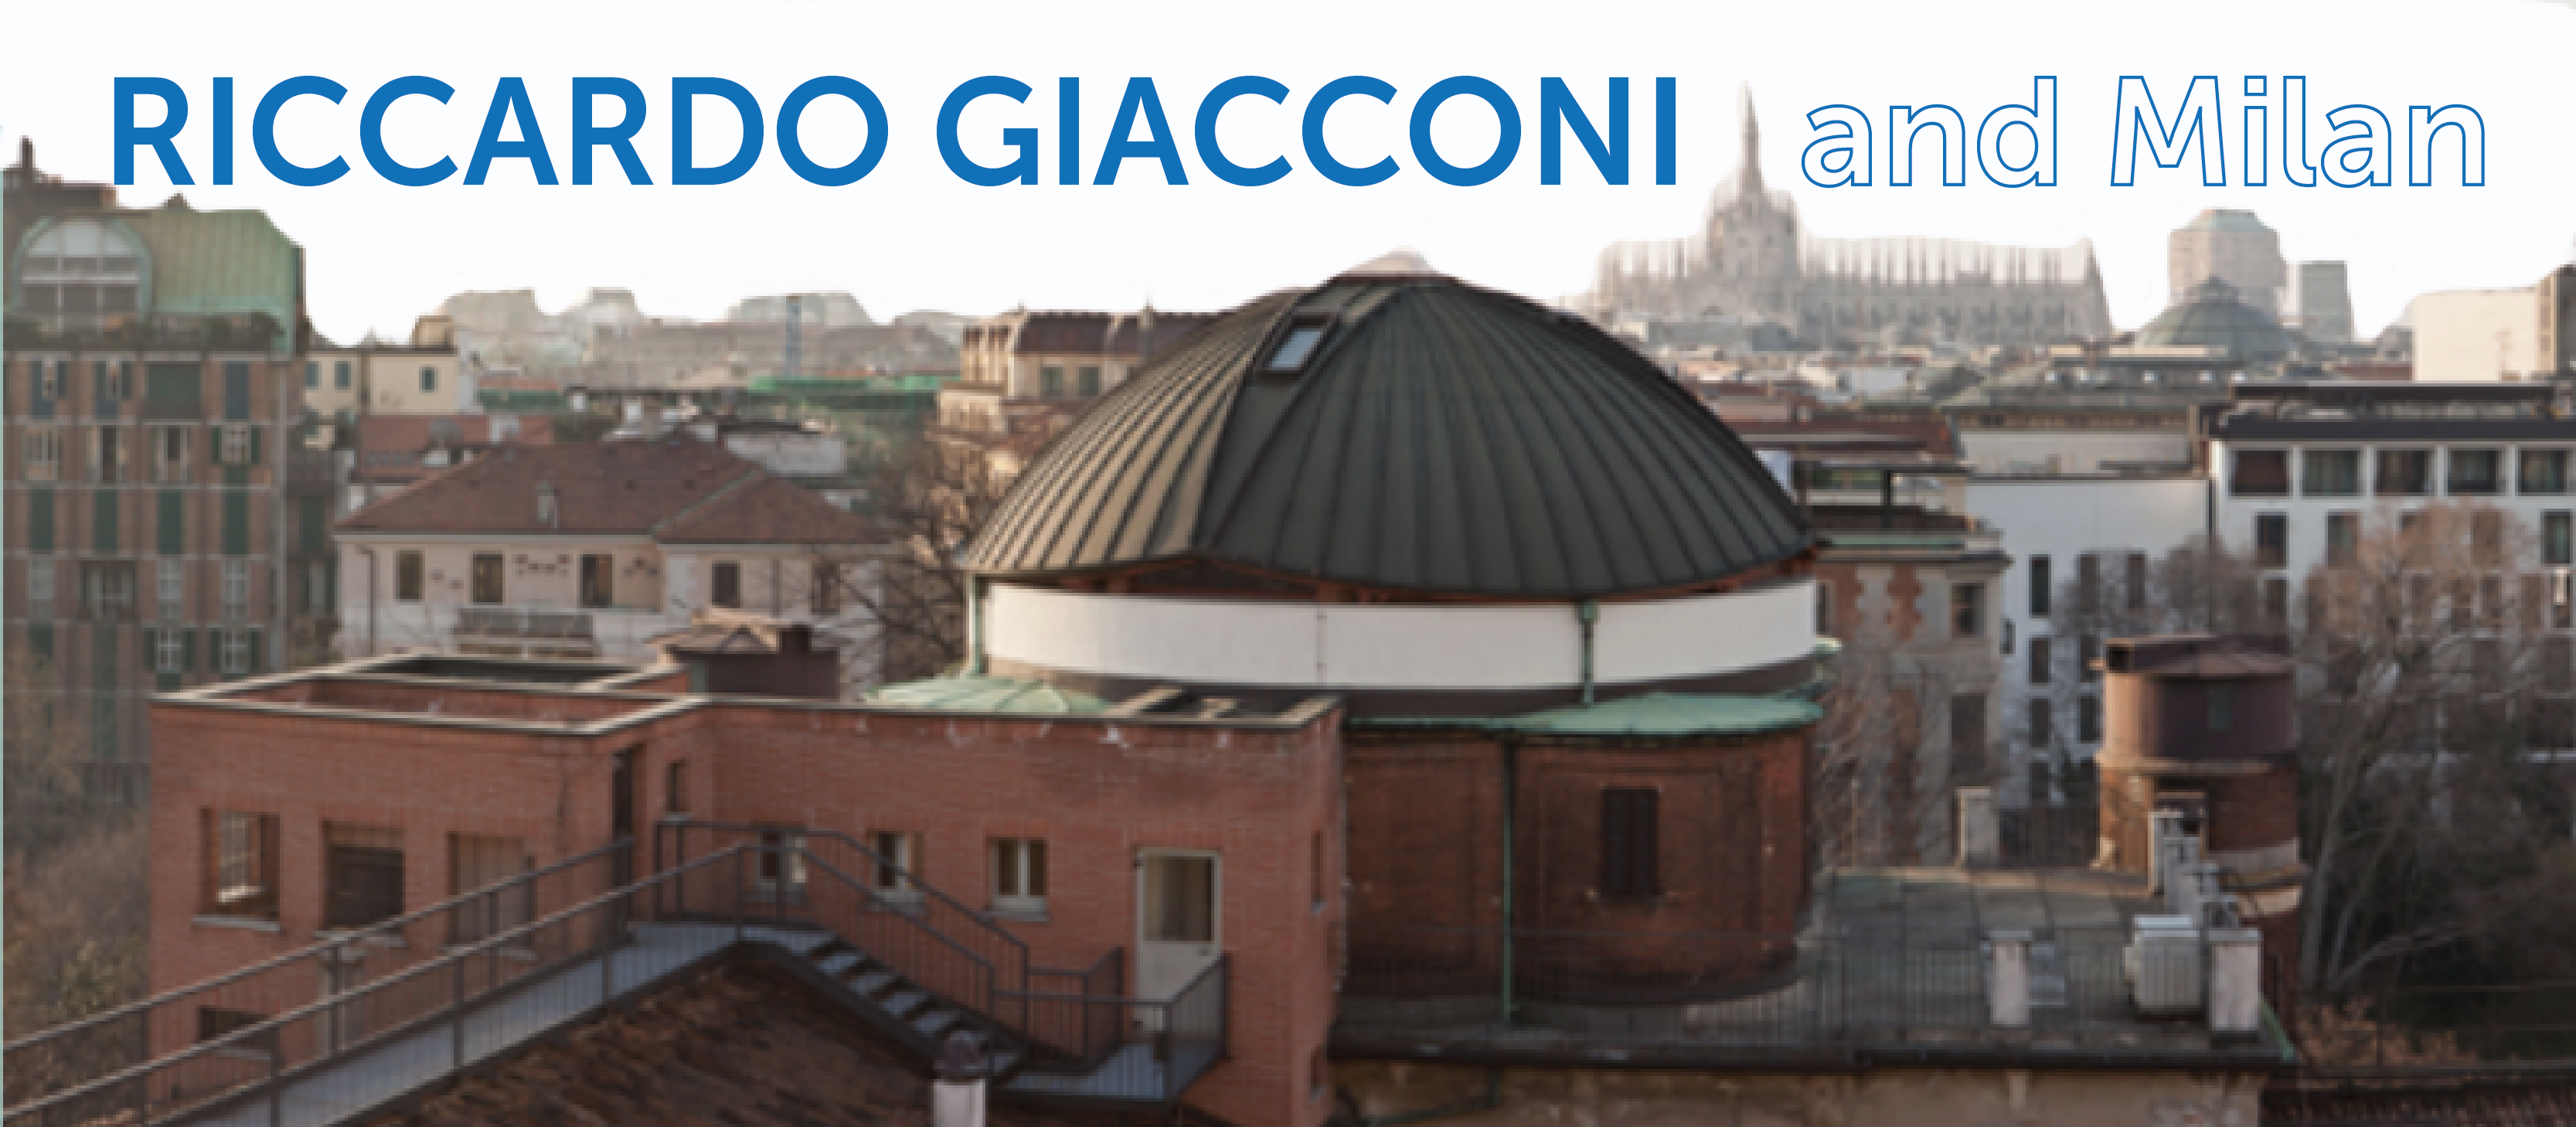 Riccardo Giacconi and Milan